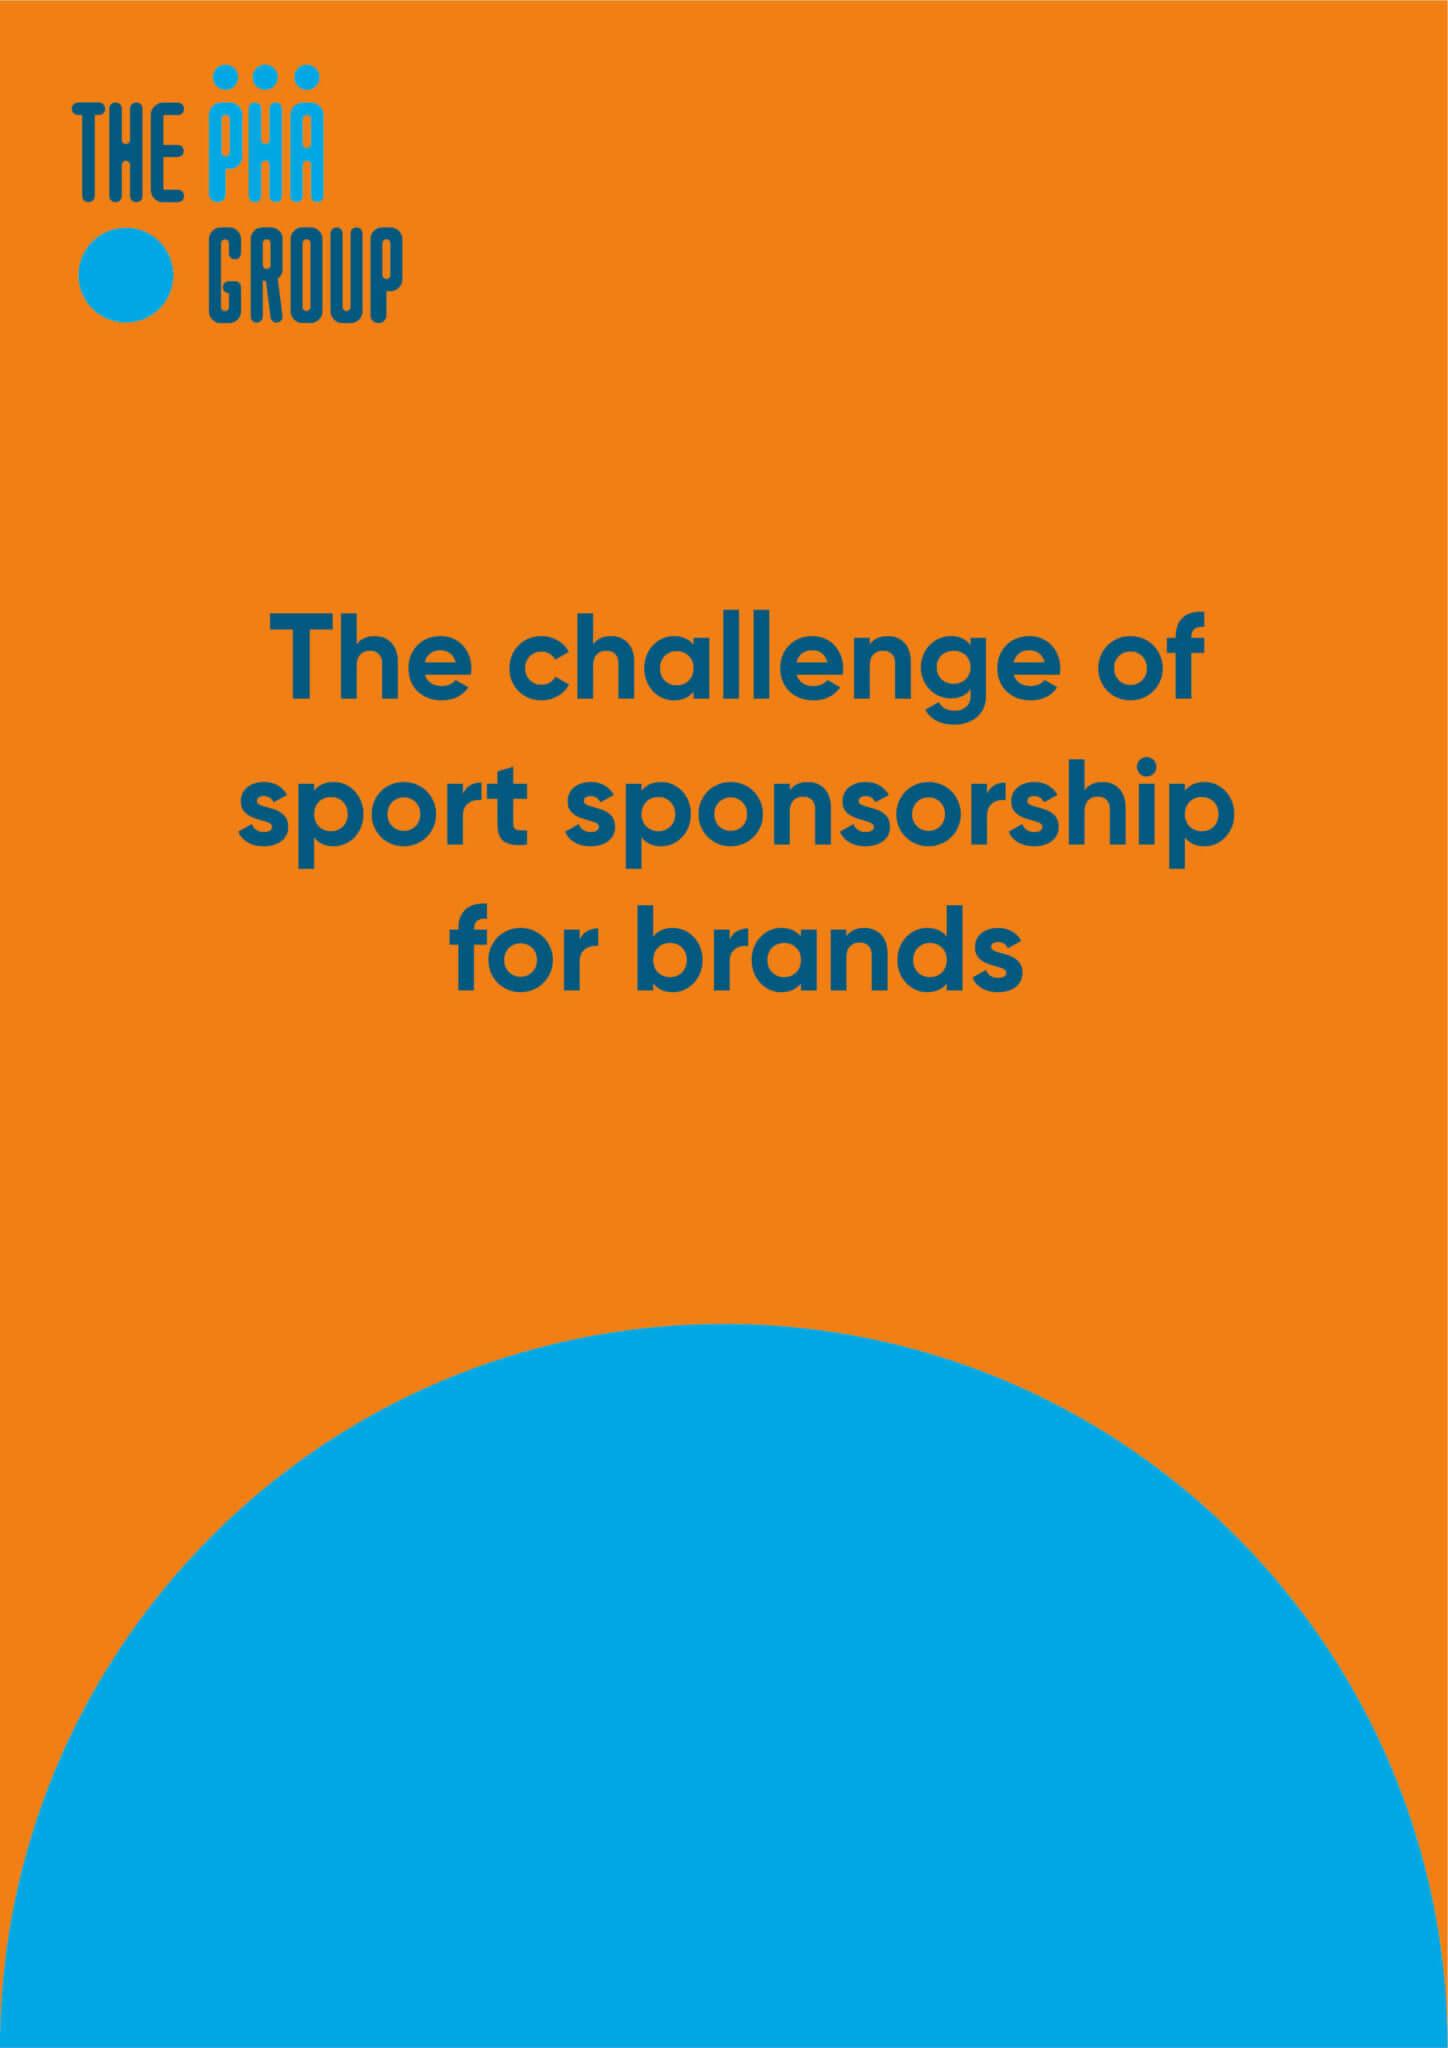 The challenge of sport sponsorship for brands